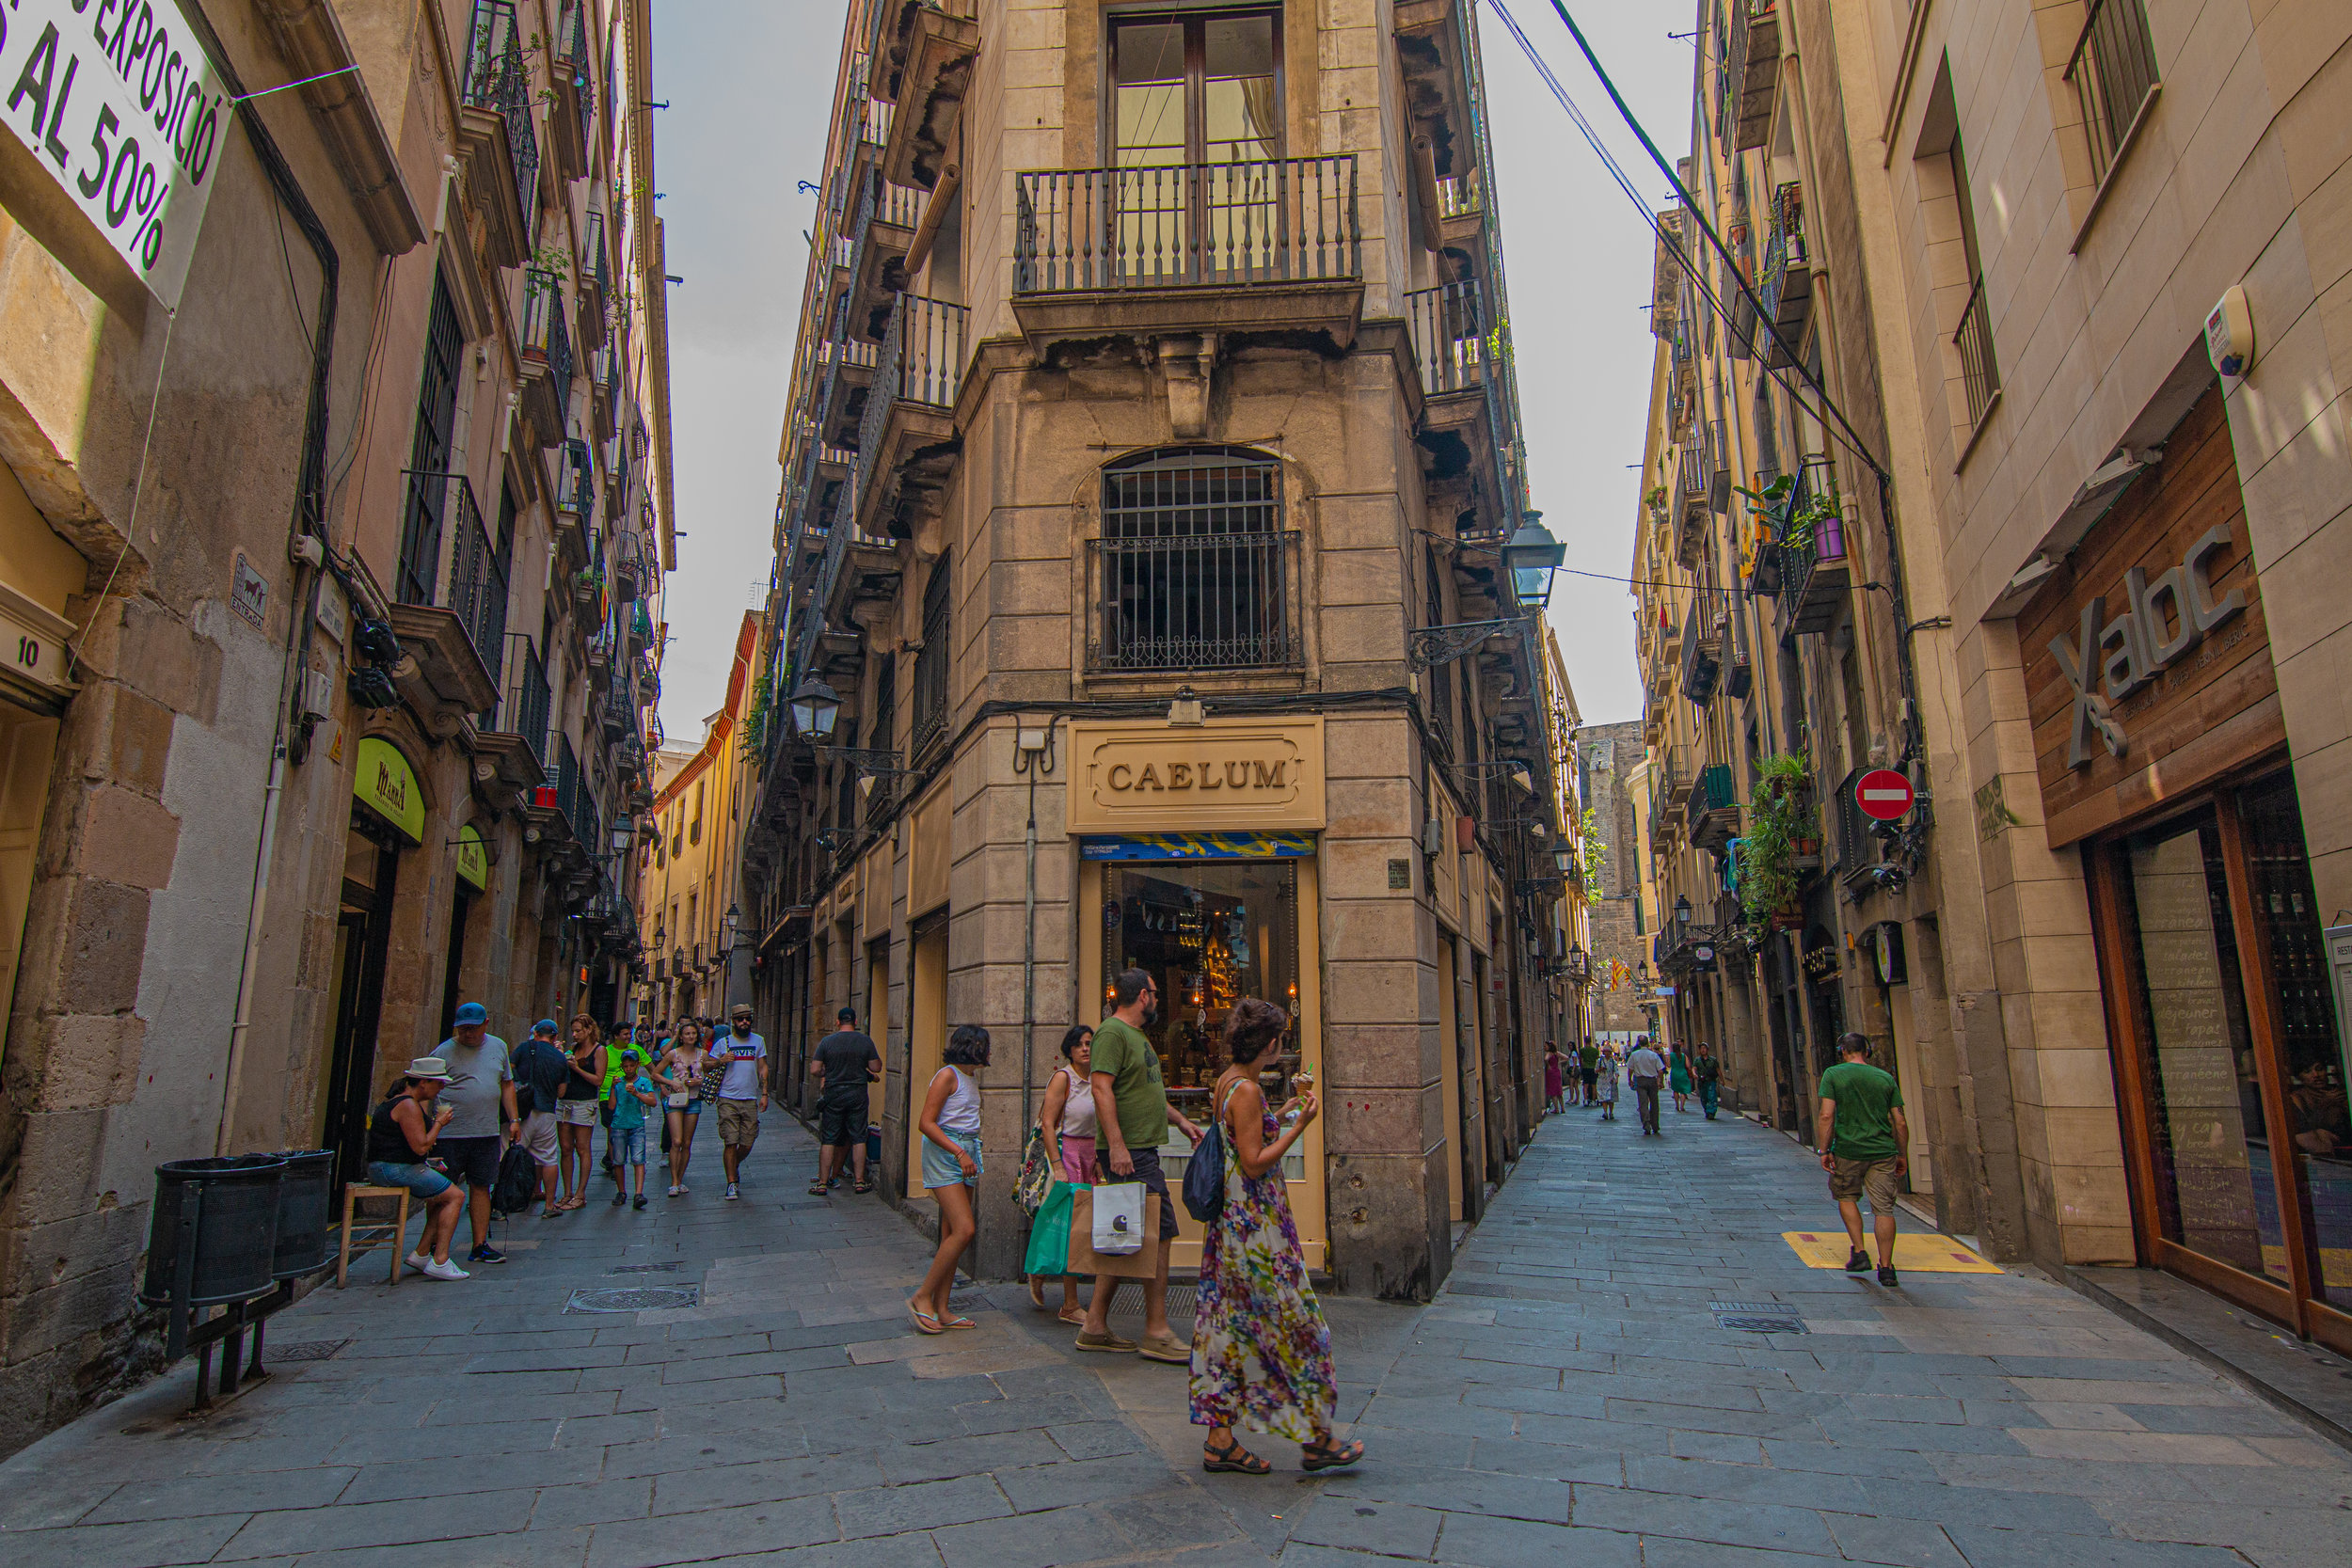 Barcelona-Gotico-9.jpg